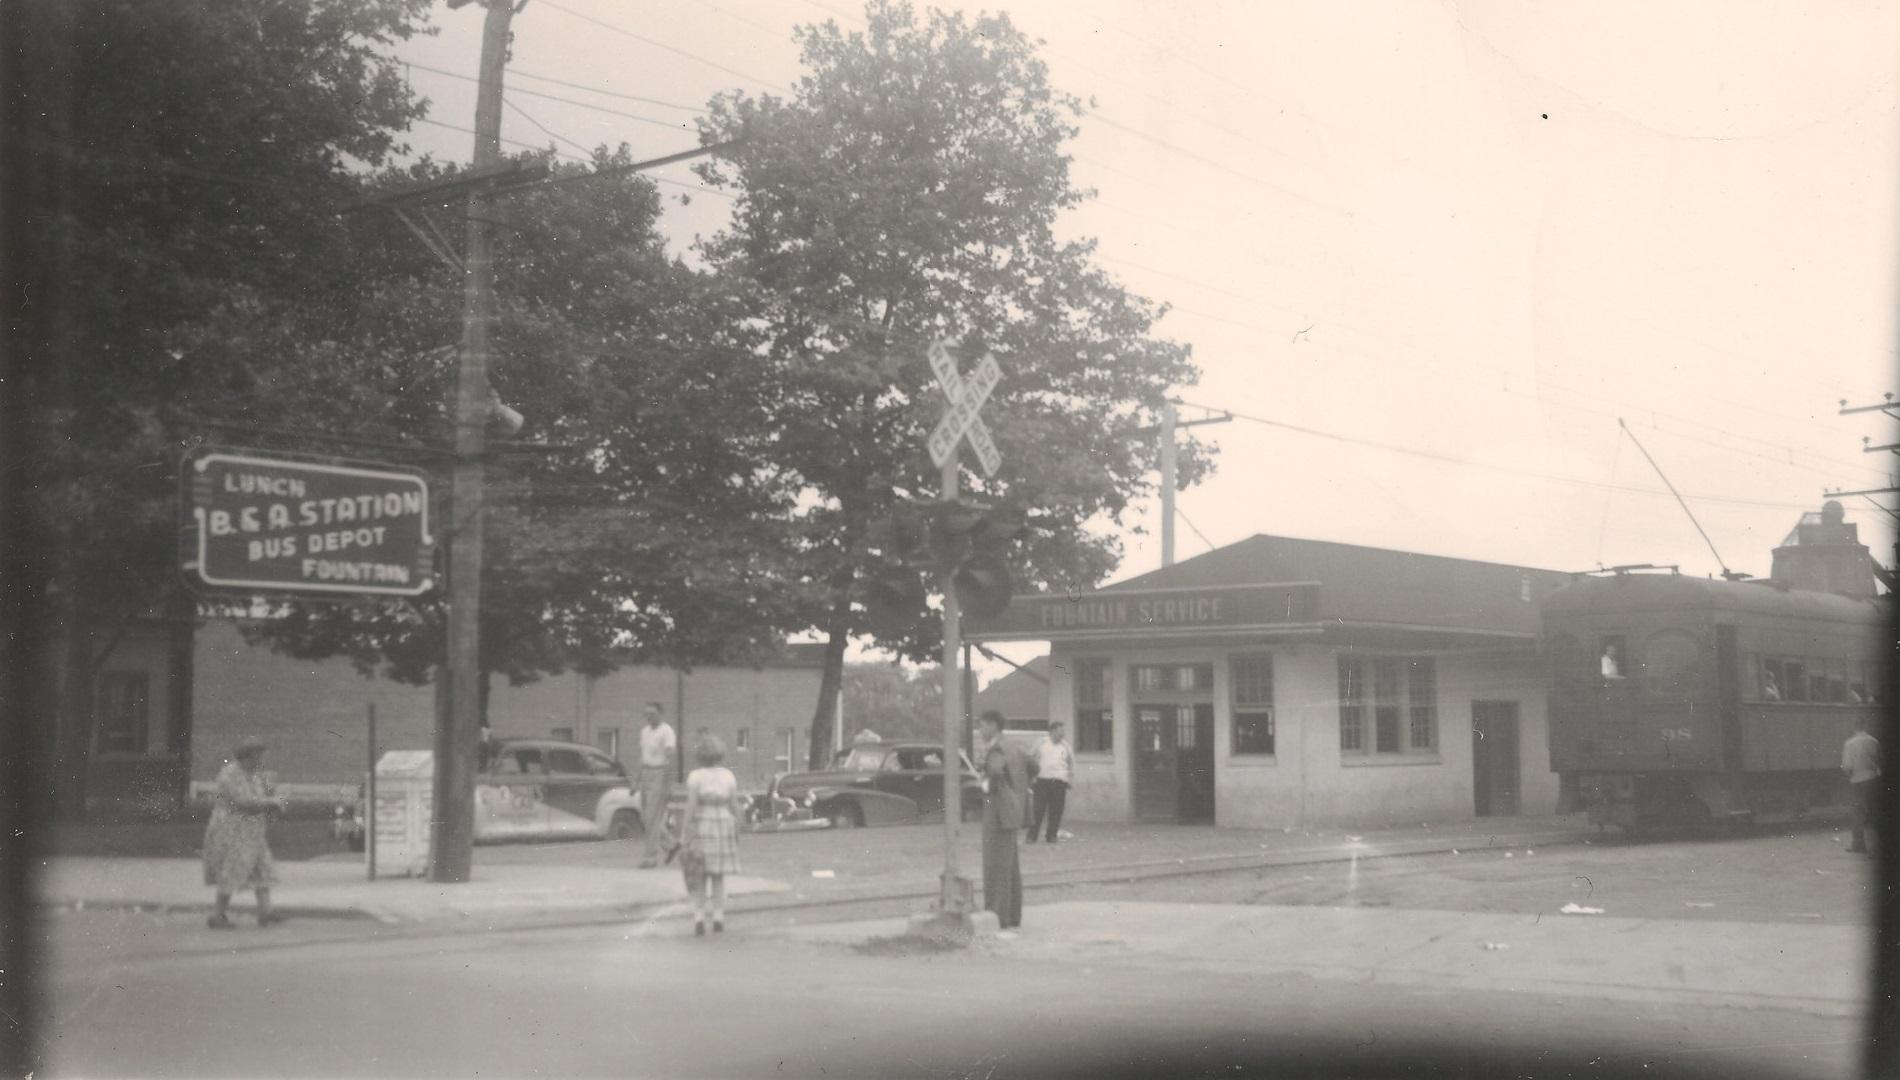 Baltimore & Annapolis Railroad Car #98 at Glen Burnie Station. Glen Burnie, Maryland Date: June 19, 1949. Source: Kevin Mueller Collection.